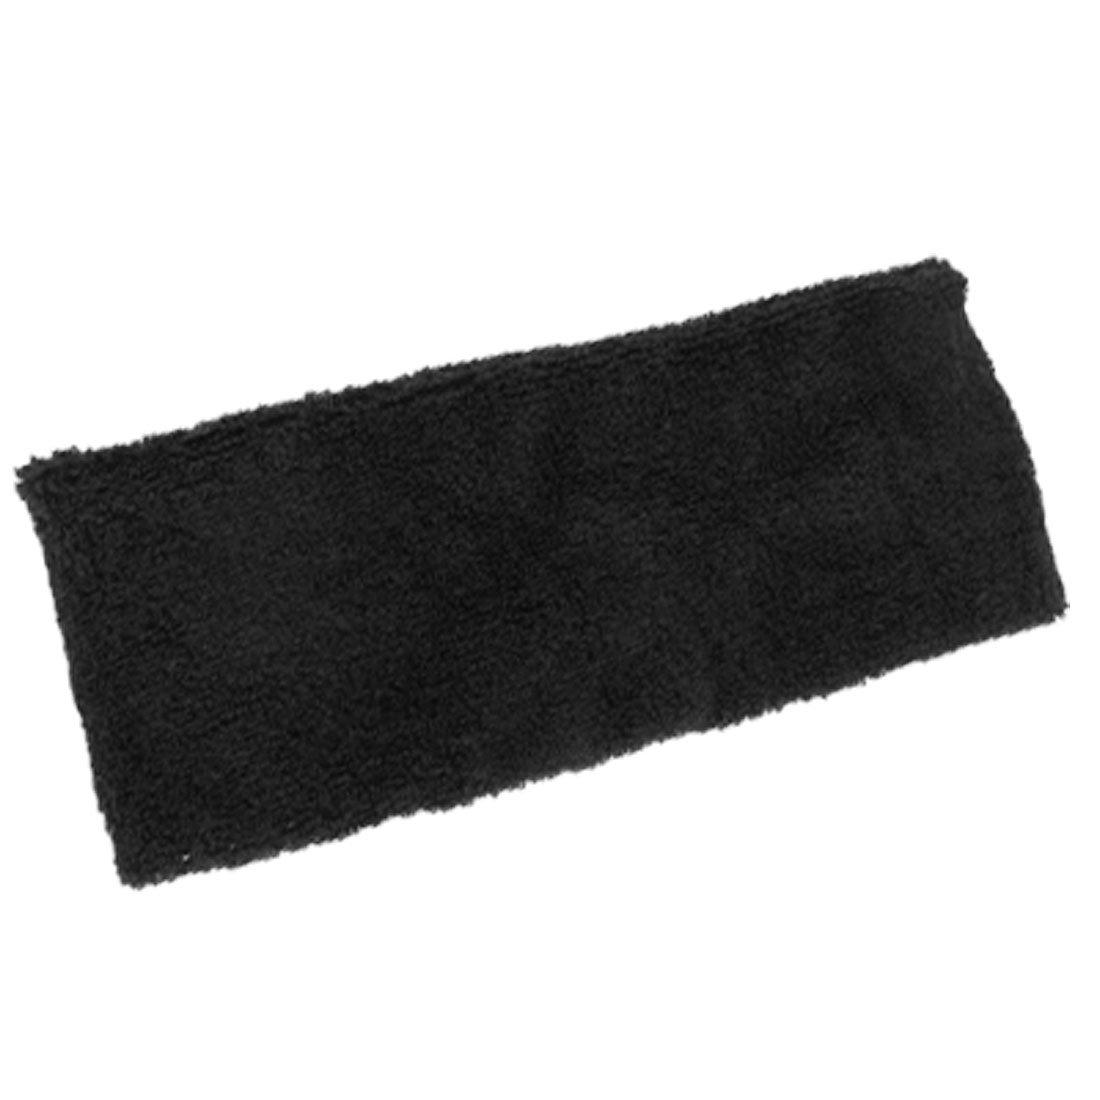 Wholesale 10PCs/Lot Protective Sports Support Soft Head Band Elastic Sweatband Black(China (Mainland))